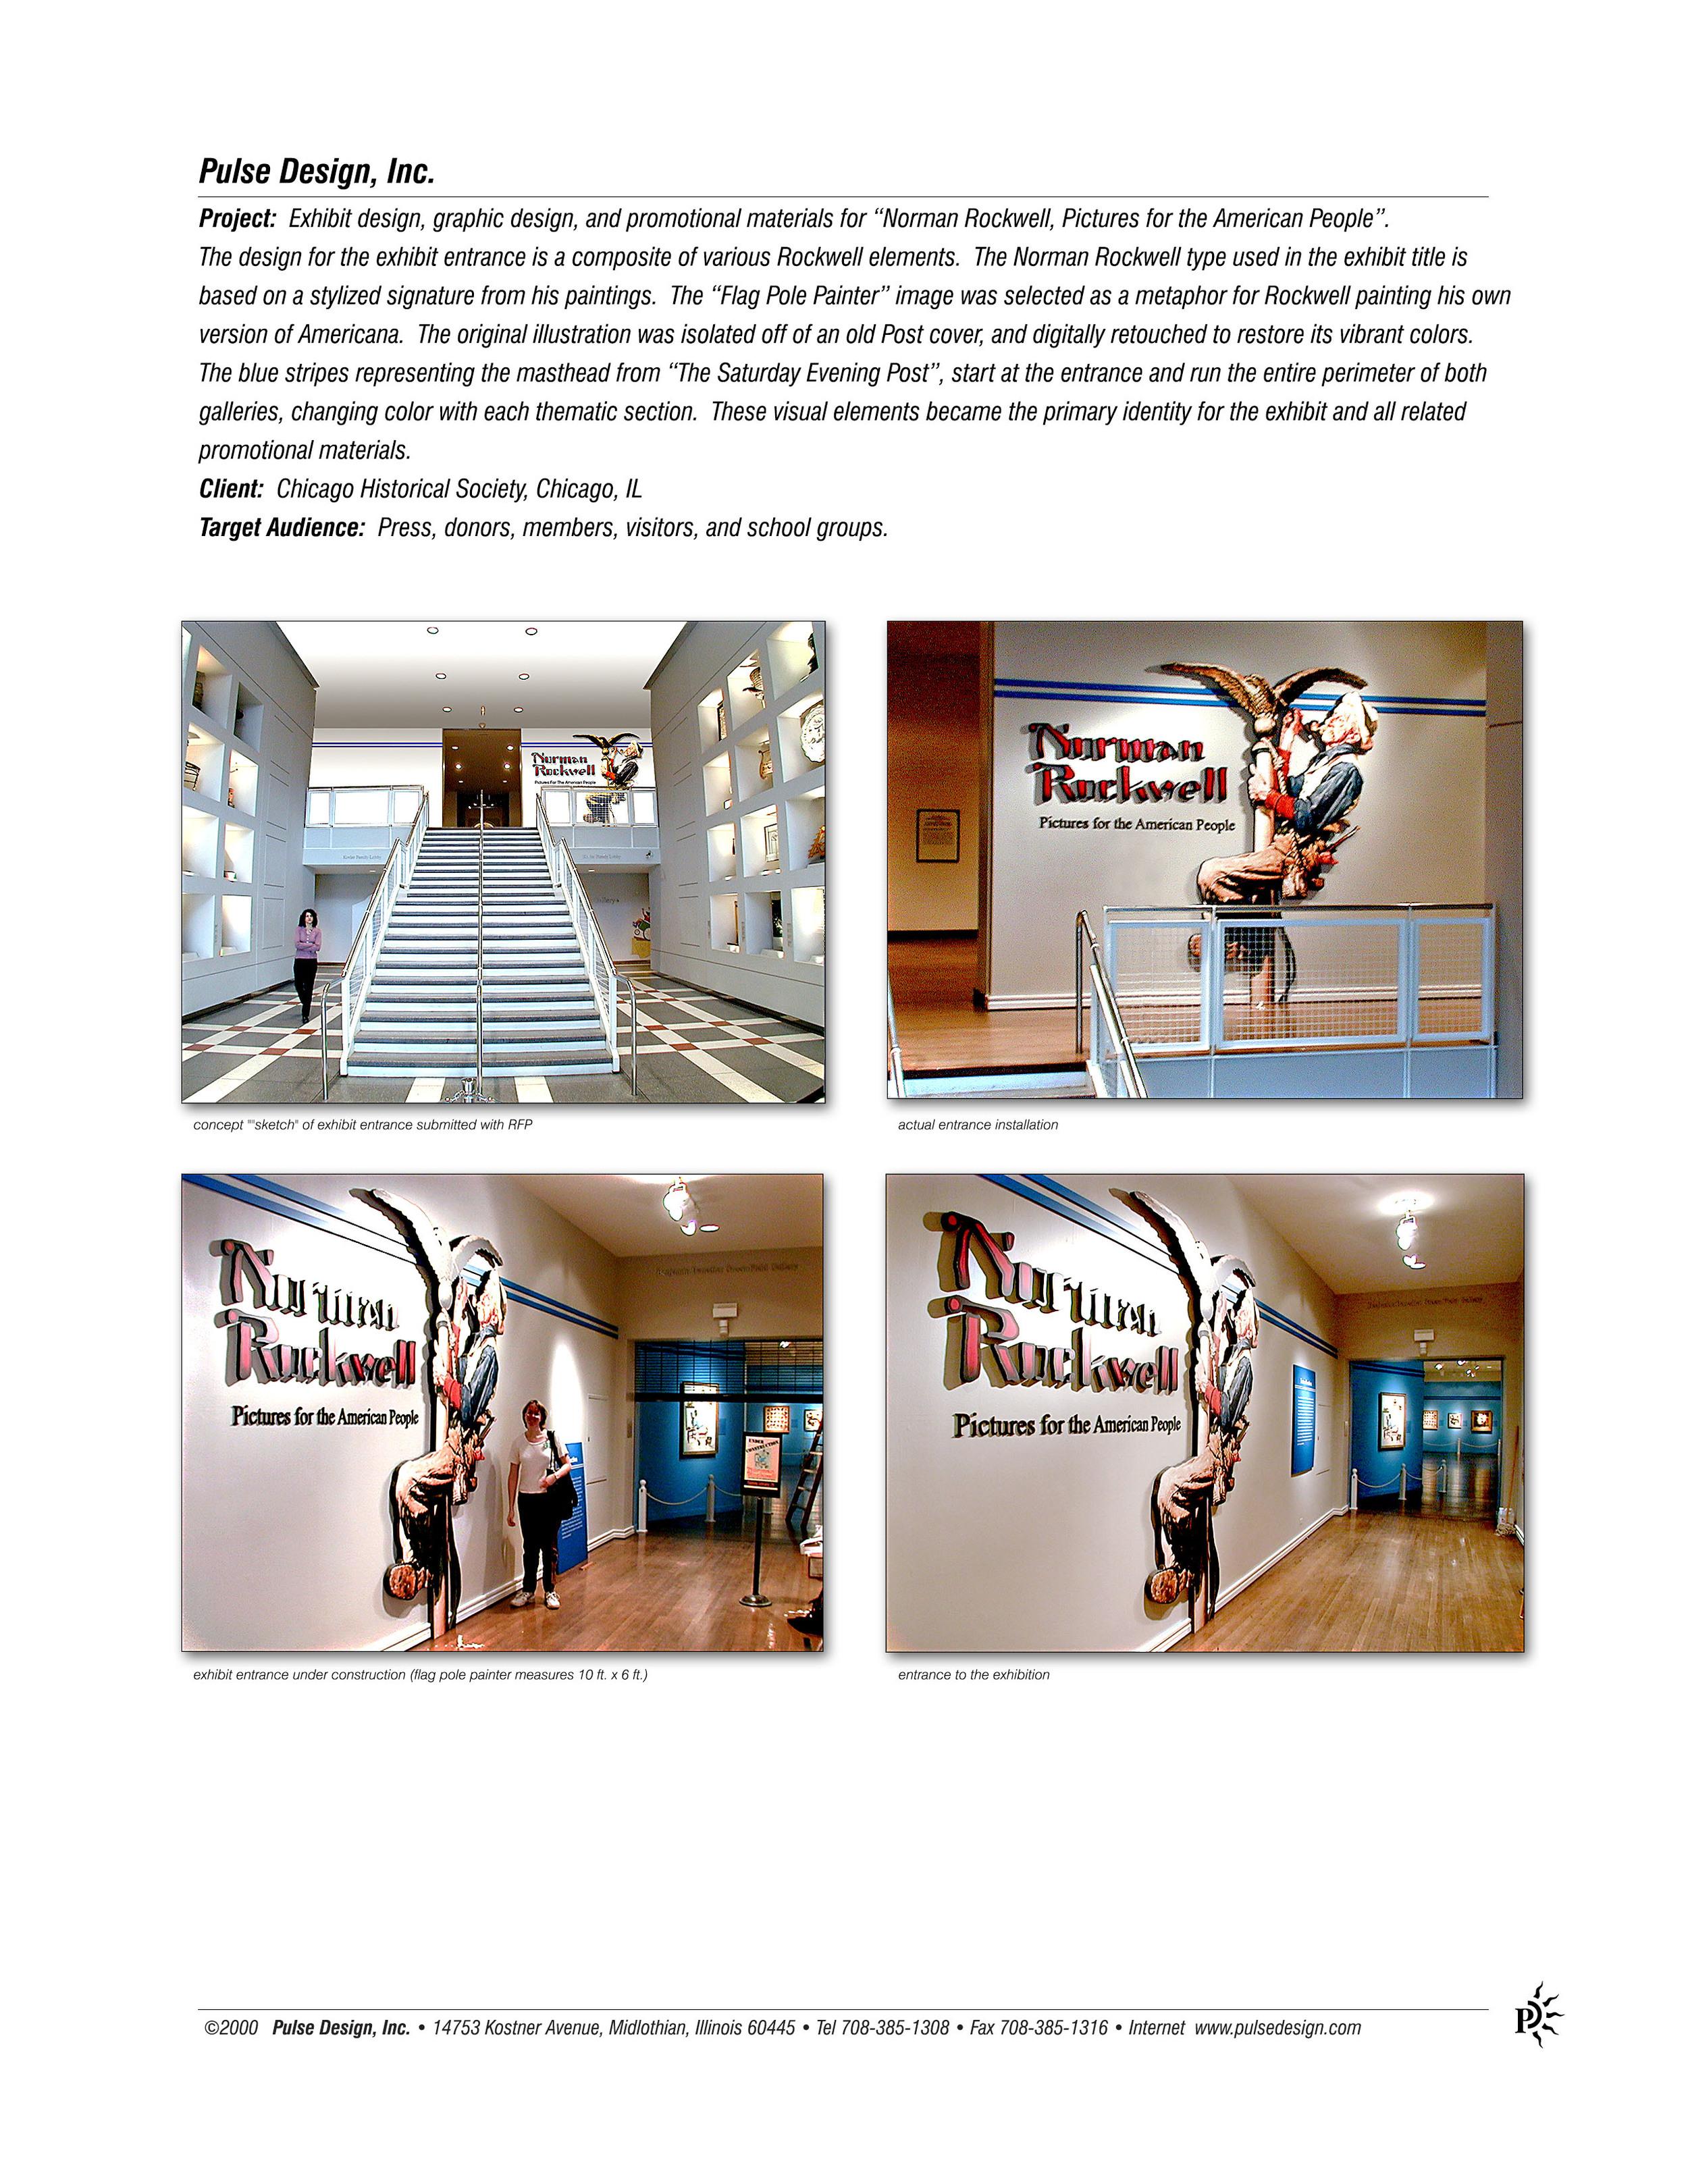 CHS-Norman-Rockwell-Exhibit-Pulse-Design-Inc.jpg